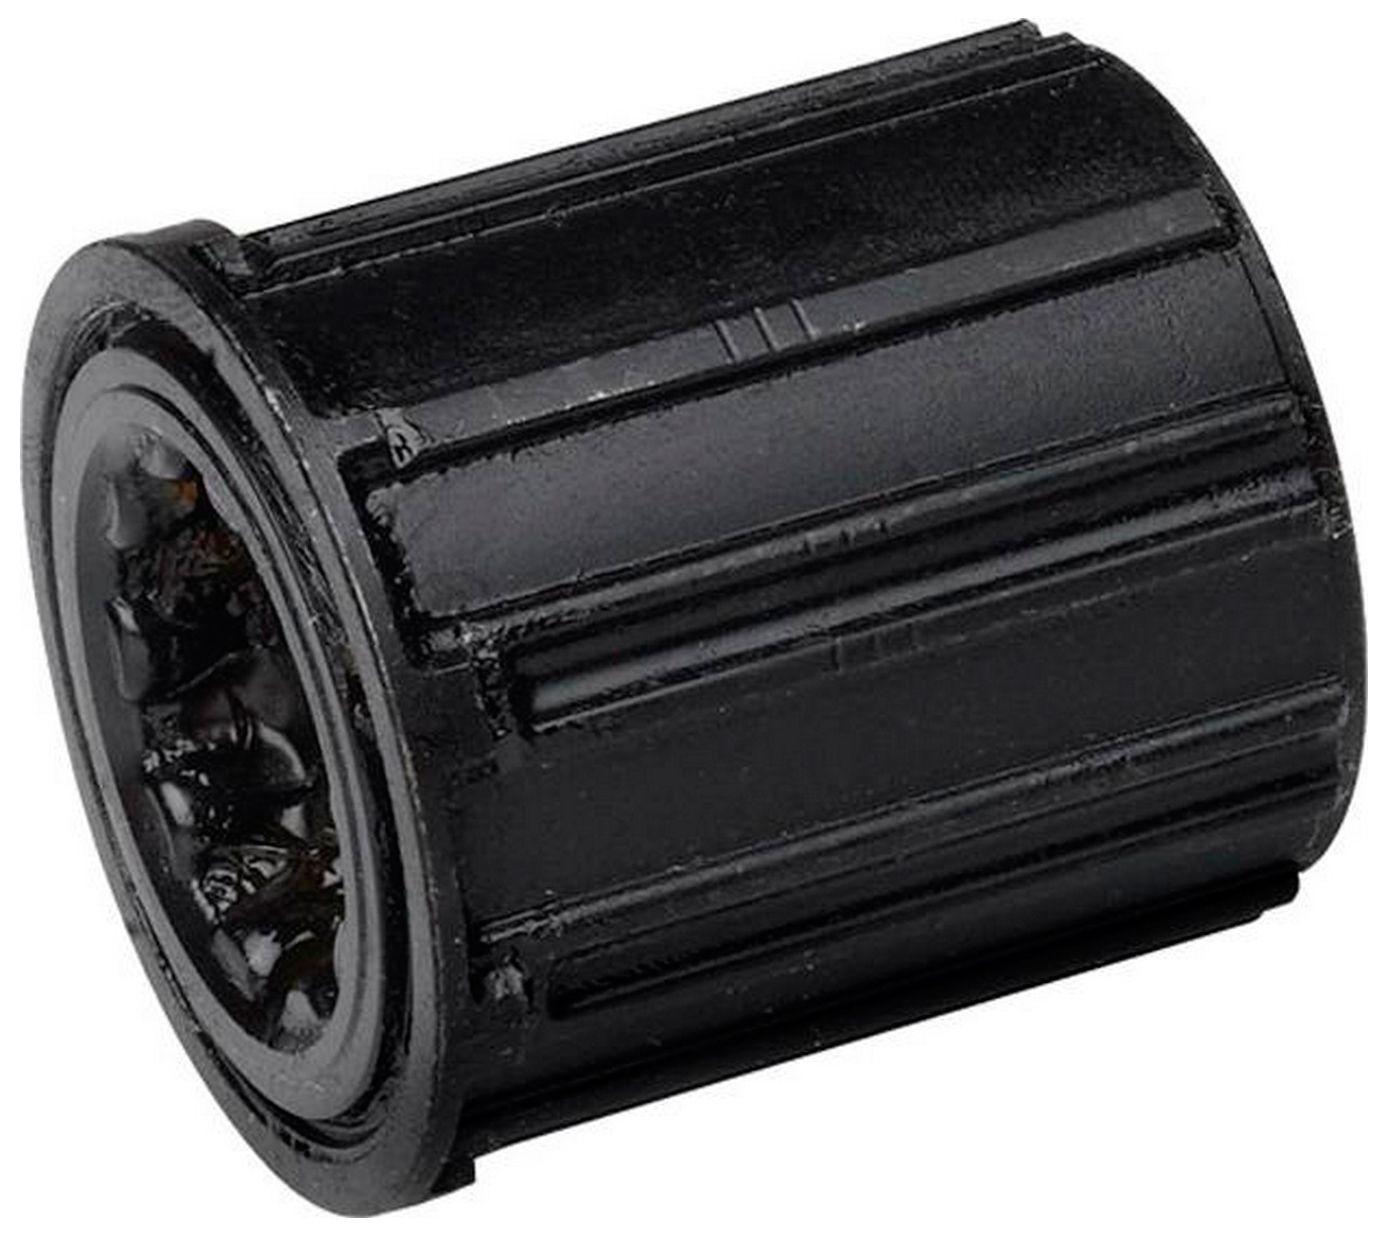 Запчасть Shimano барабан XT, для FH-M760,  привод  - артикул:287166